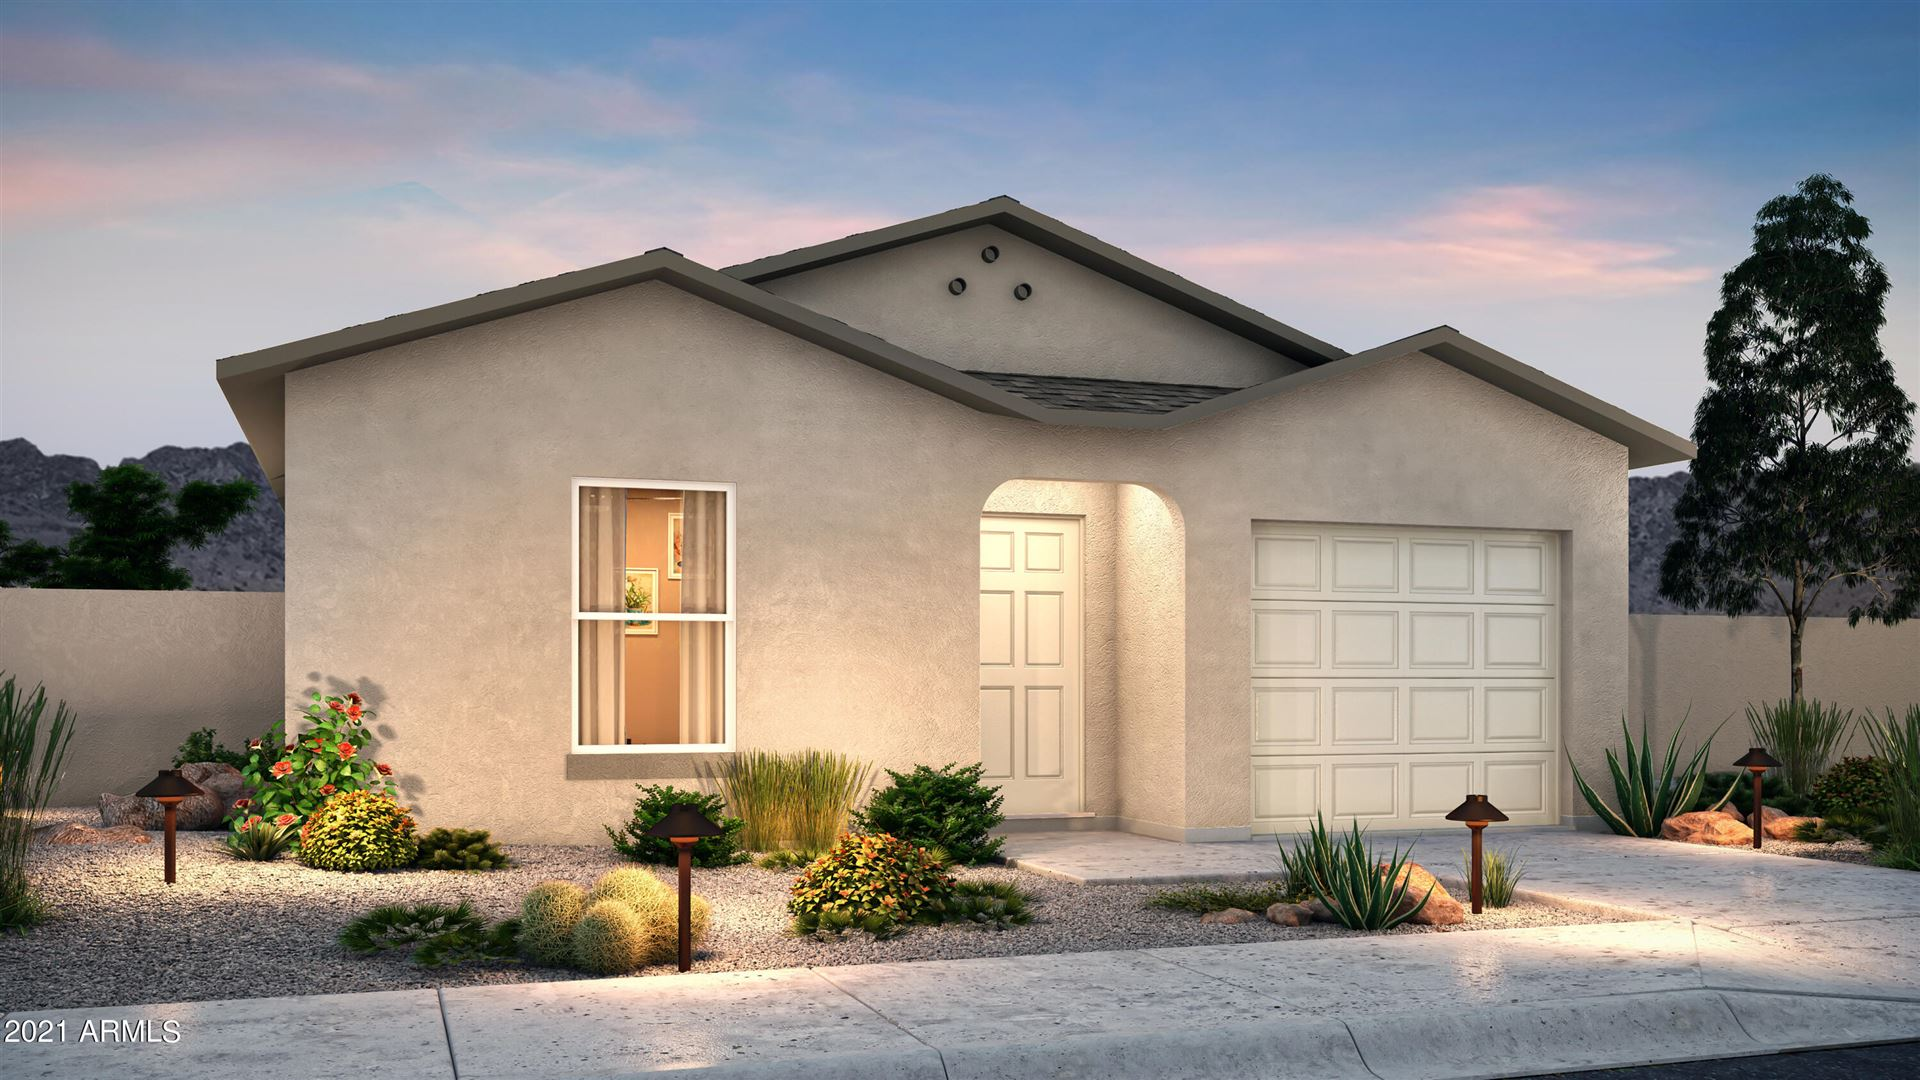 Photo of 474 Cahan Drive, Morristown, AZ 85342 (MLS # 6288673)